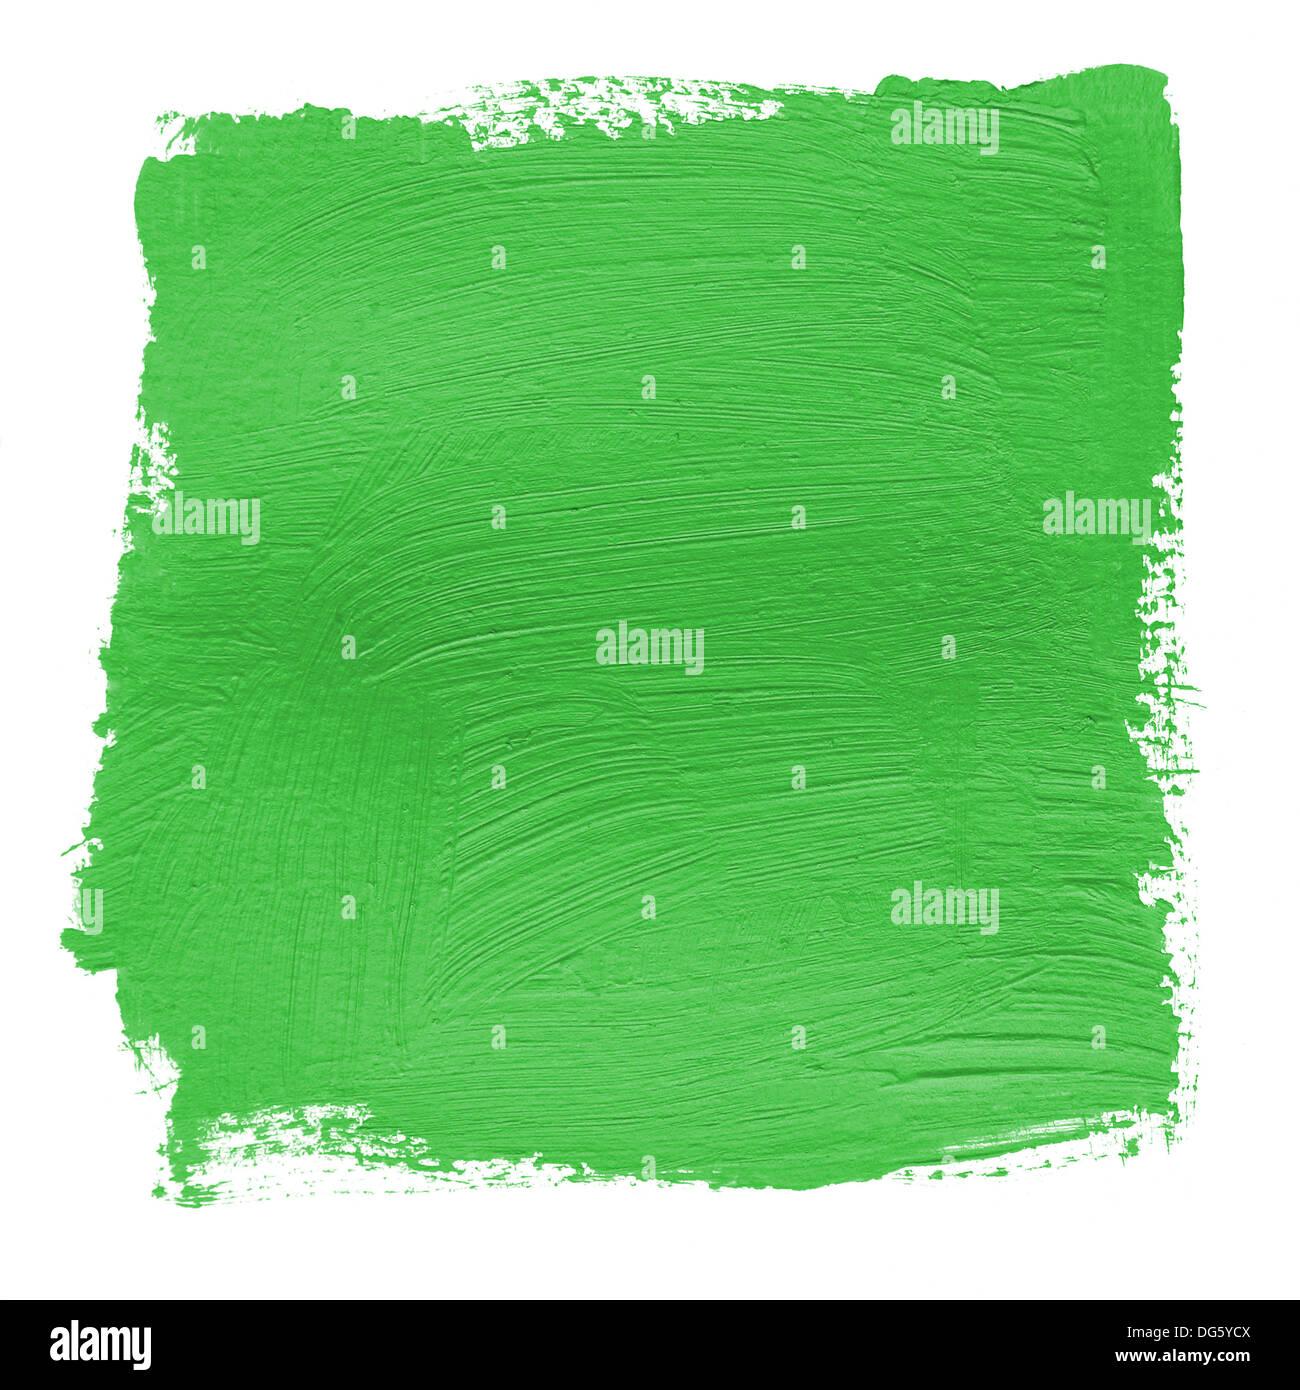 Dipinto a mano con sfondo verde vernice acrilica Immagini Stock